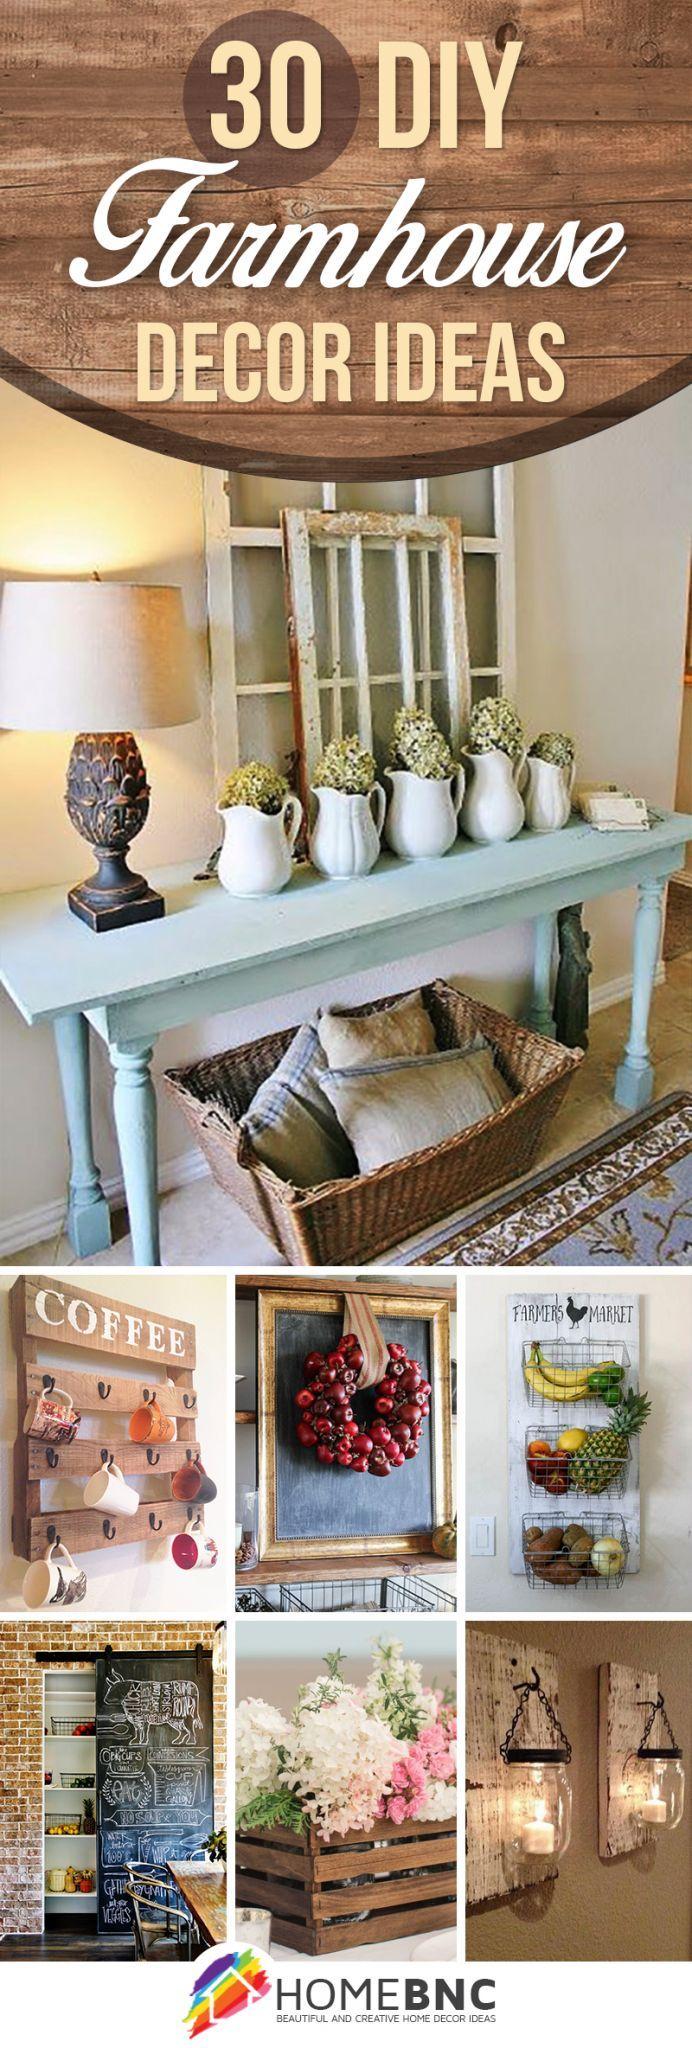 30 Ways DIY Farmhouse Decor Ideas Can Make Your Home